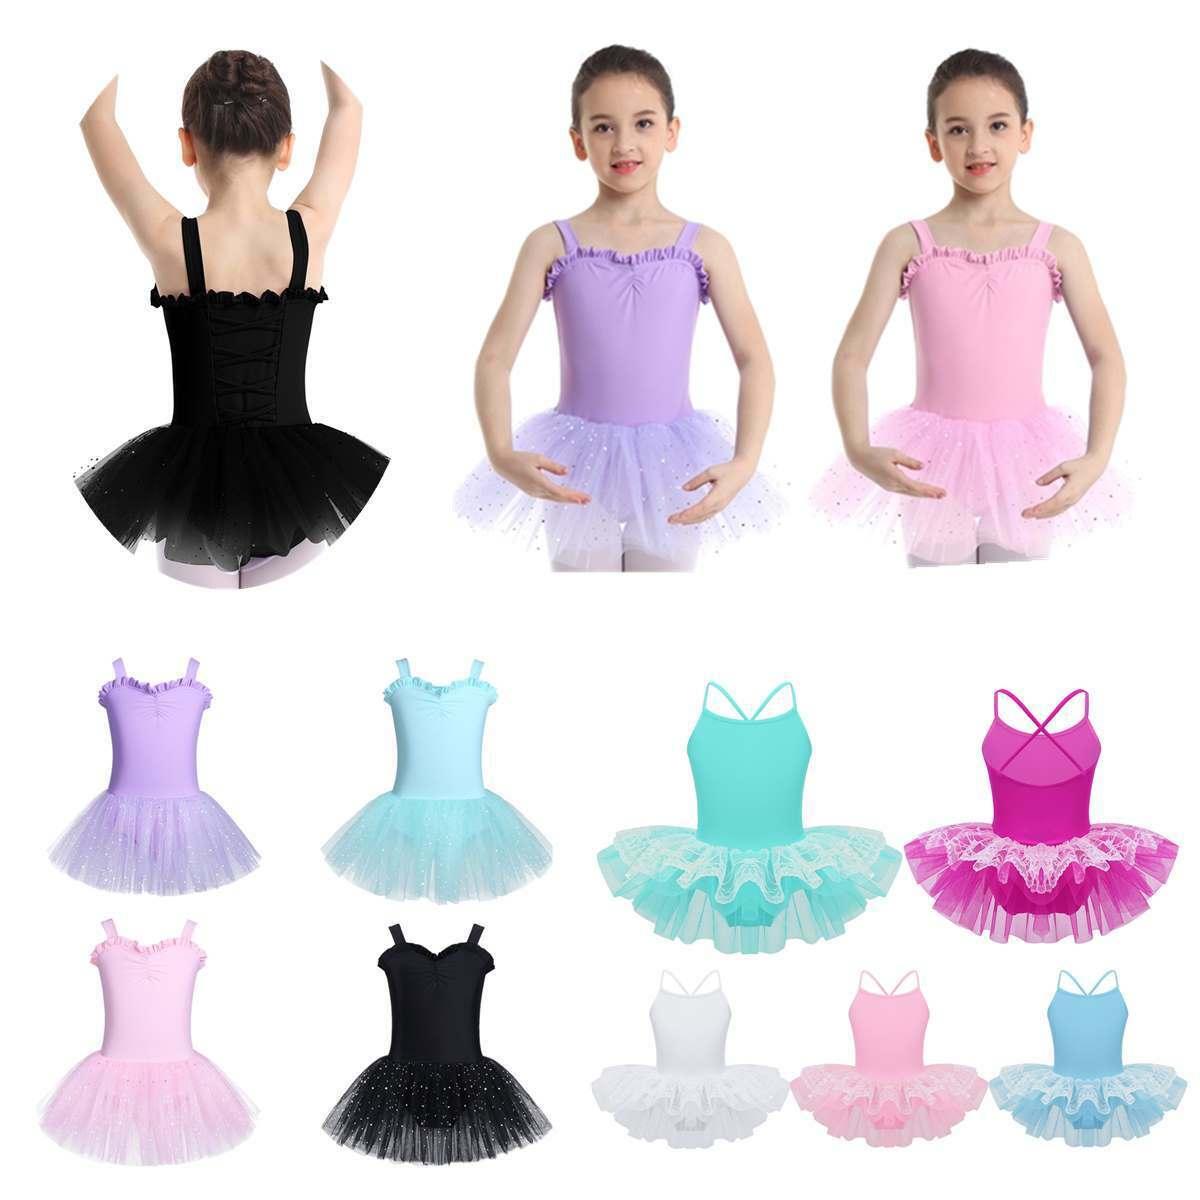 Kids Girls Ruffled Sweetheart Chest Ballet Dance Leotard Dress Mesh Tutu Skirt